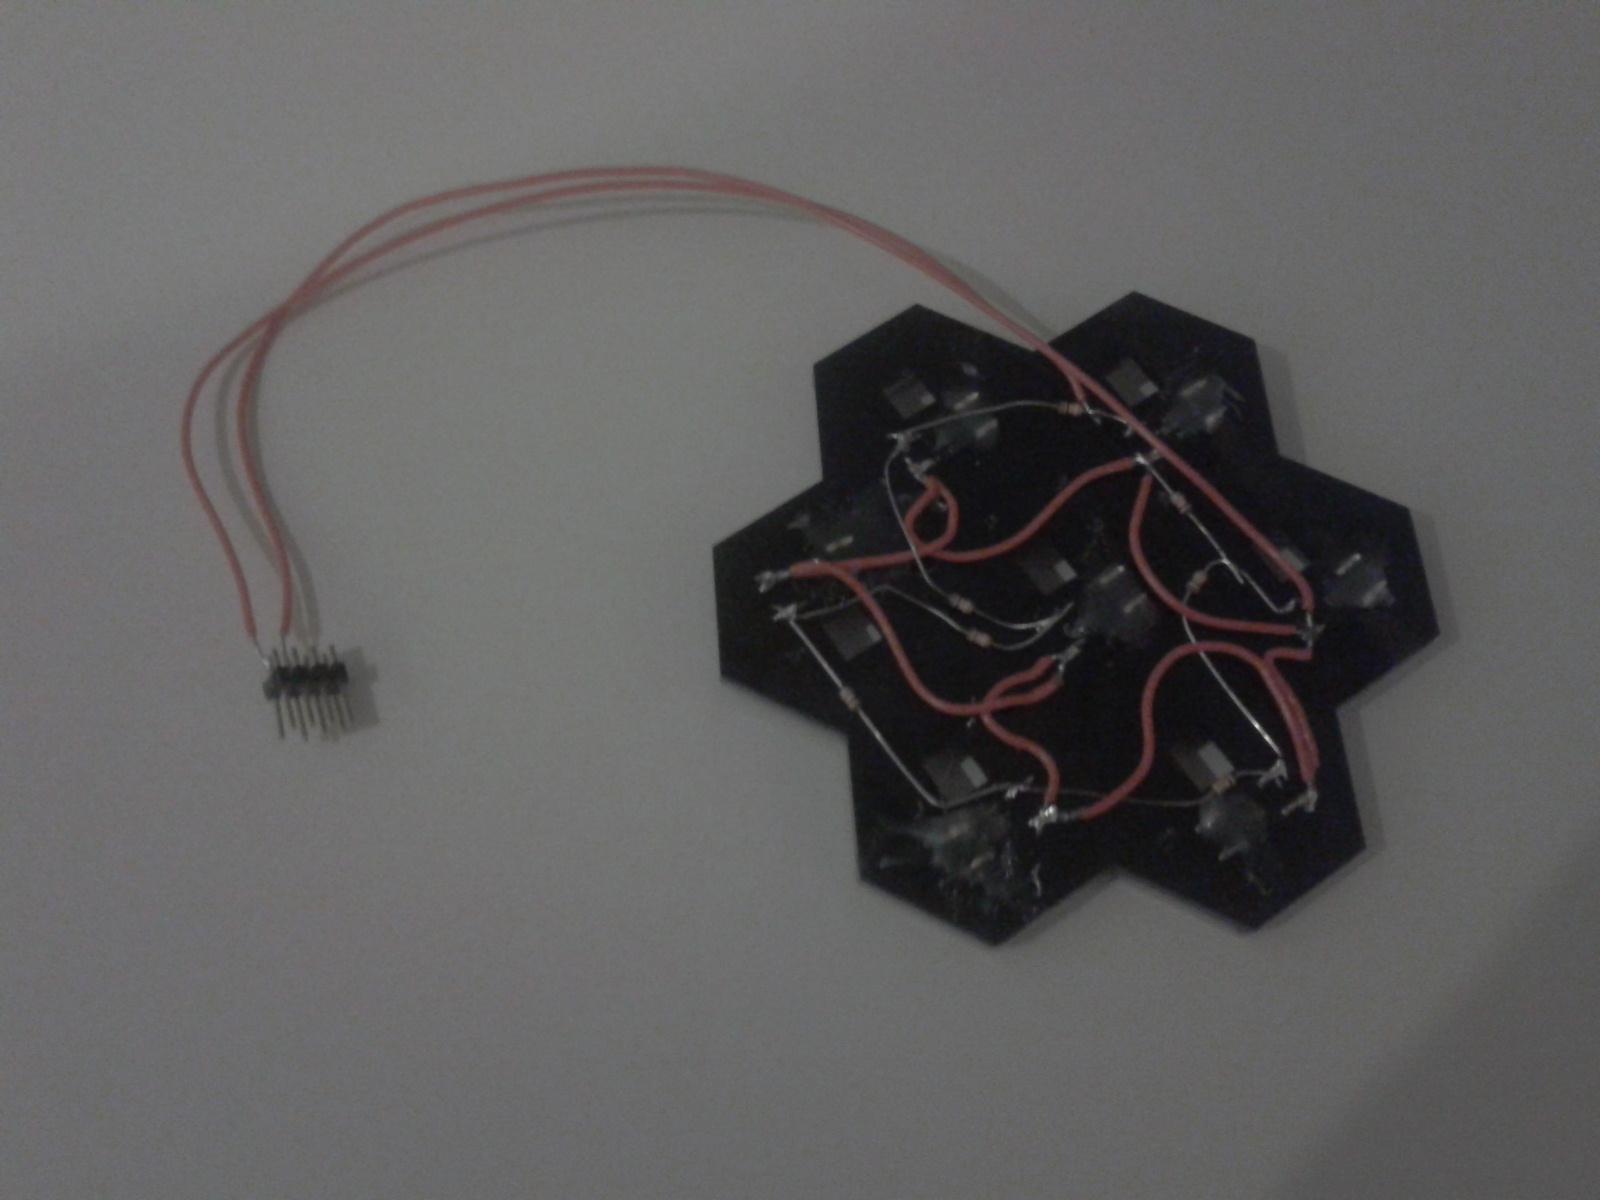 Nerd Club: Resistor ladder for digital board game